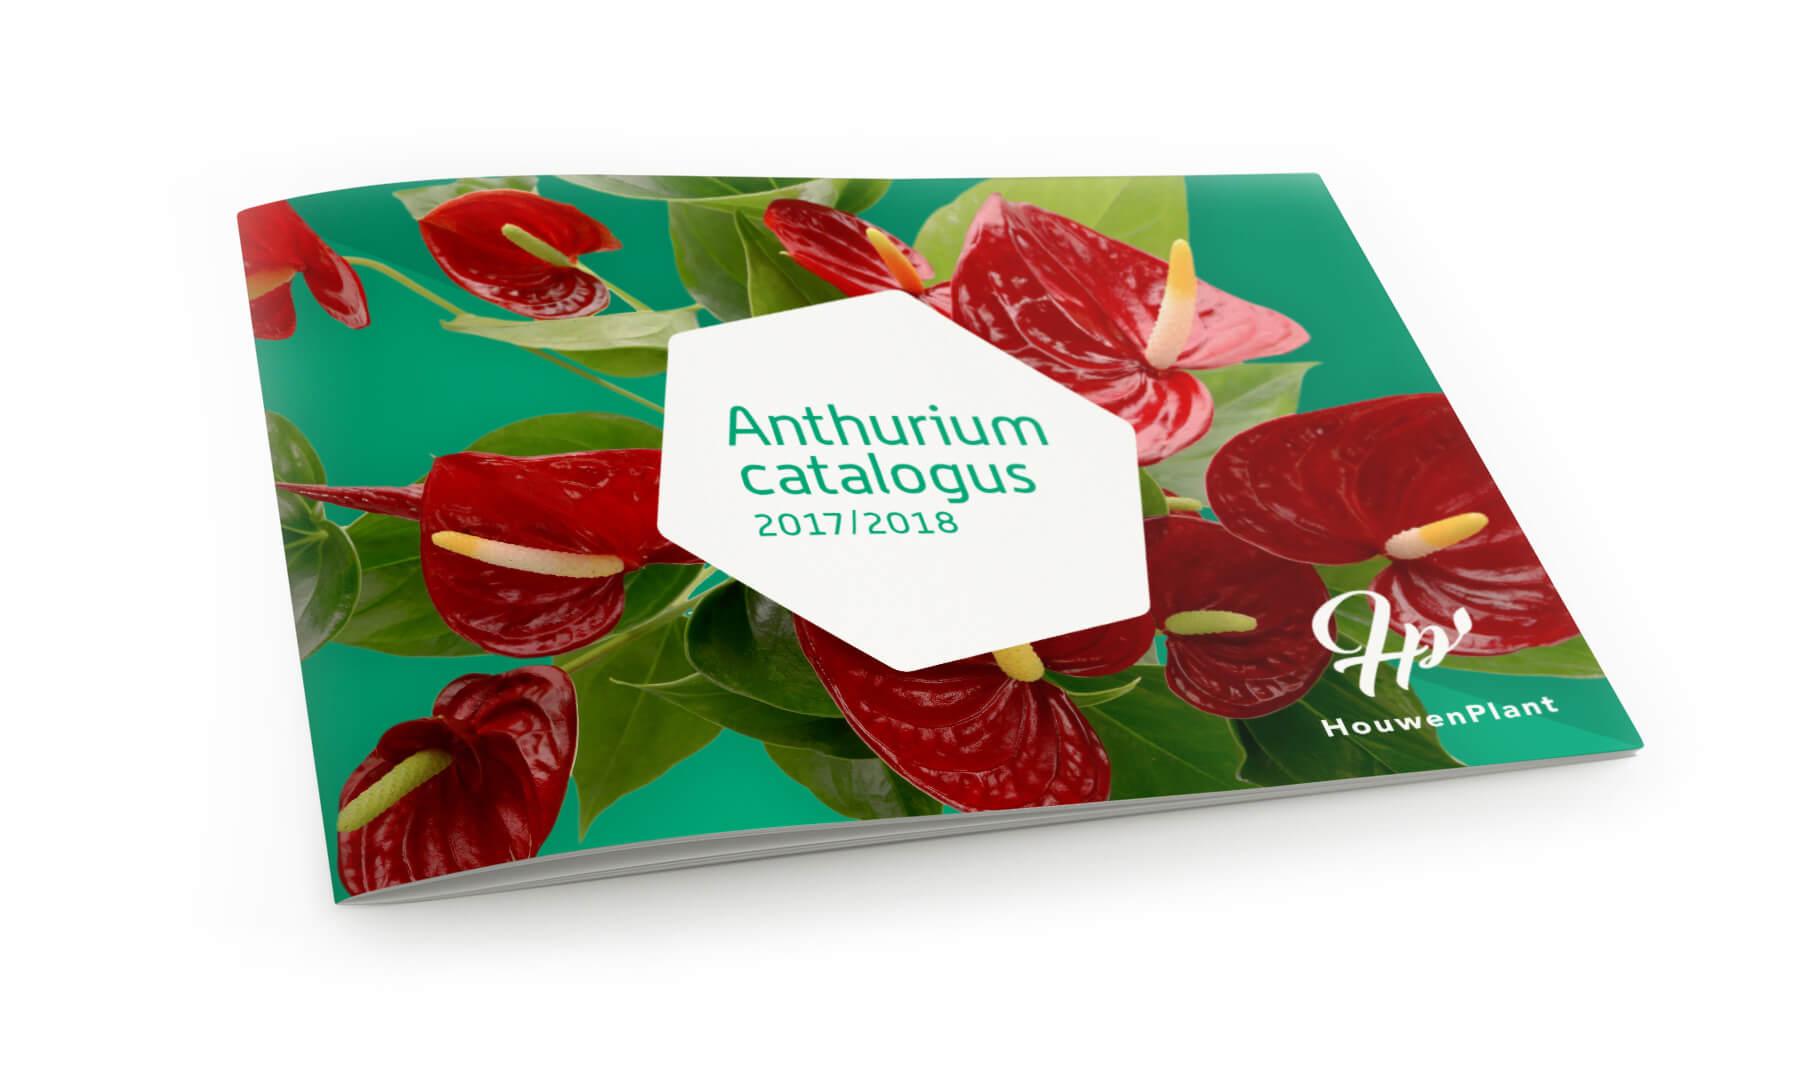 Houwenplant brochure voorkant.jpg